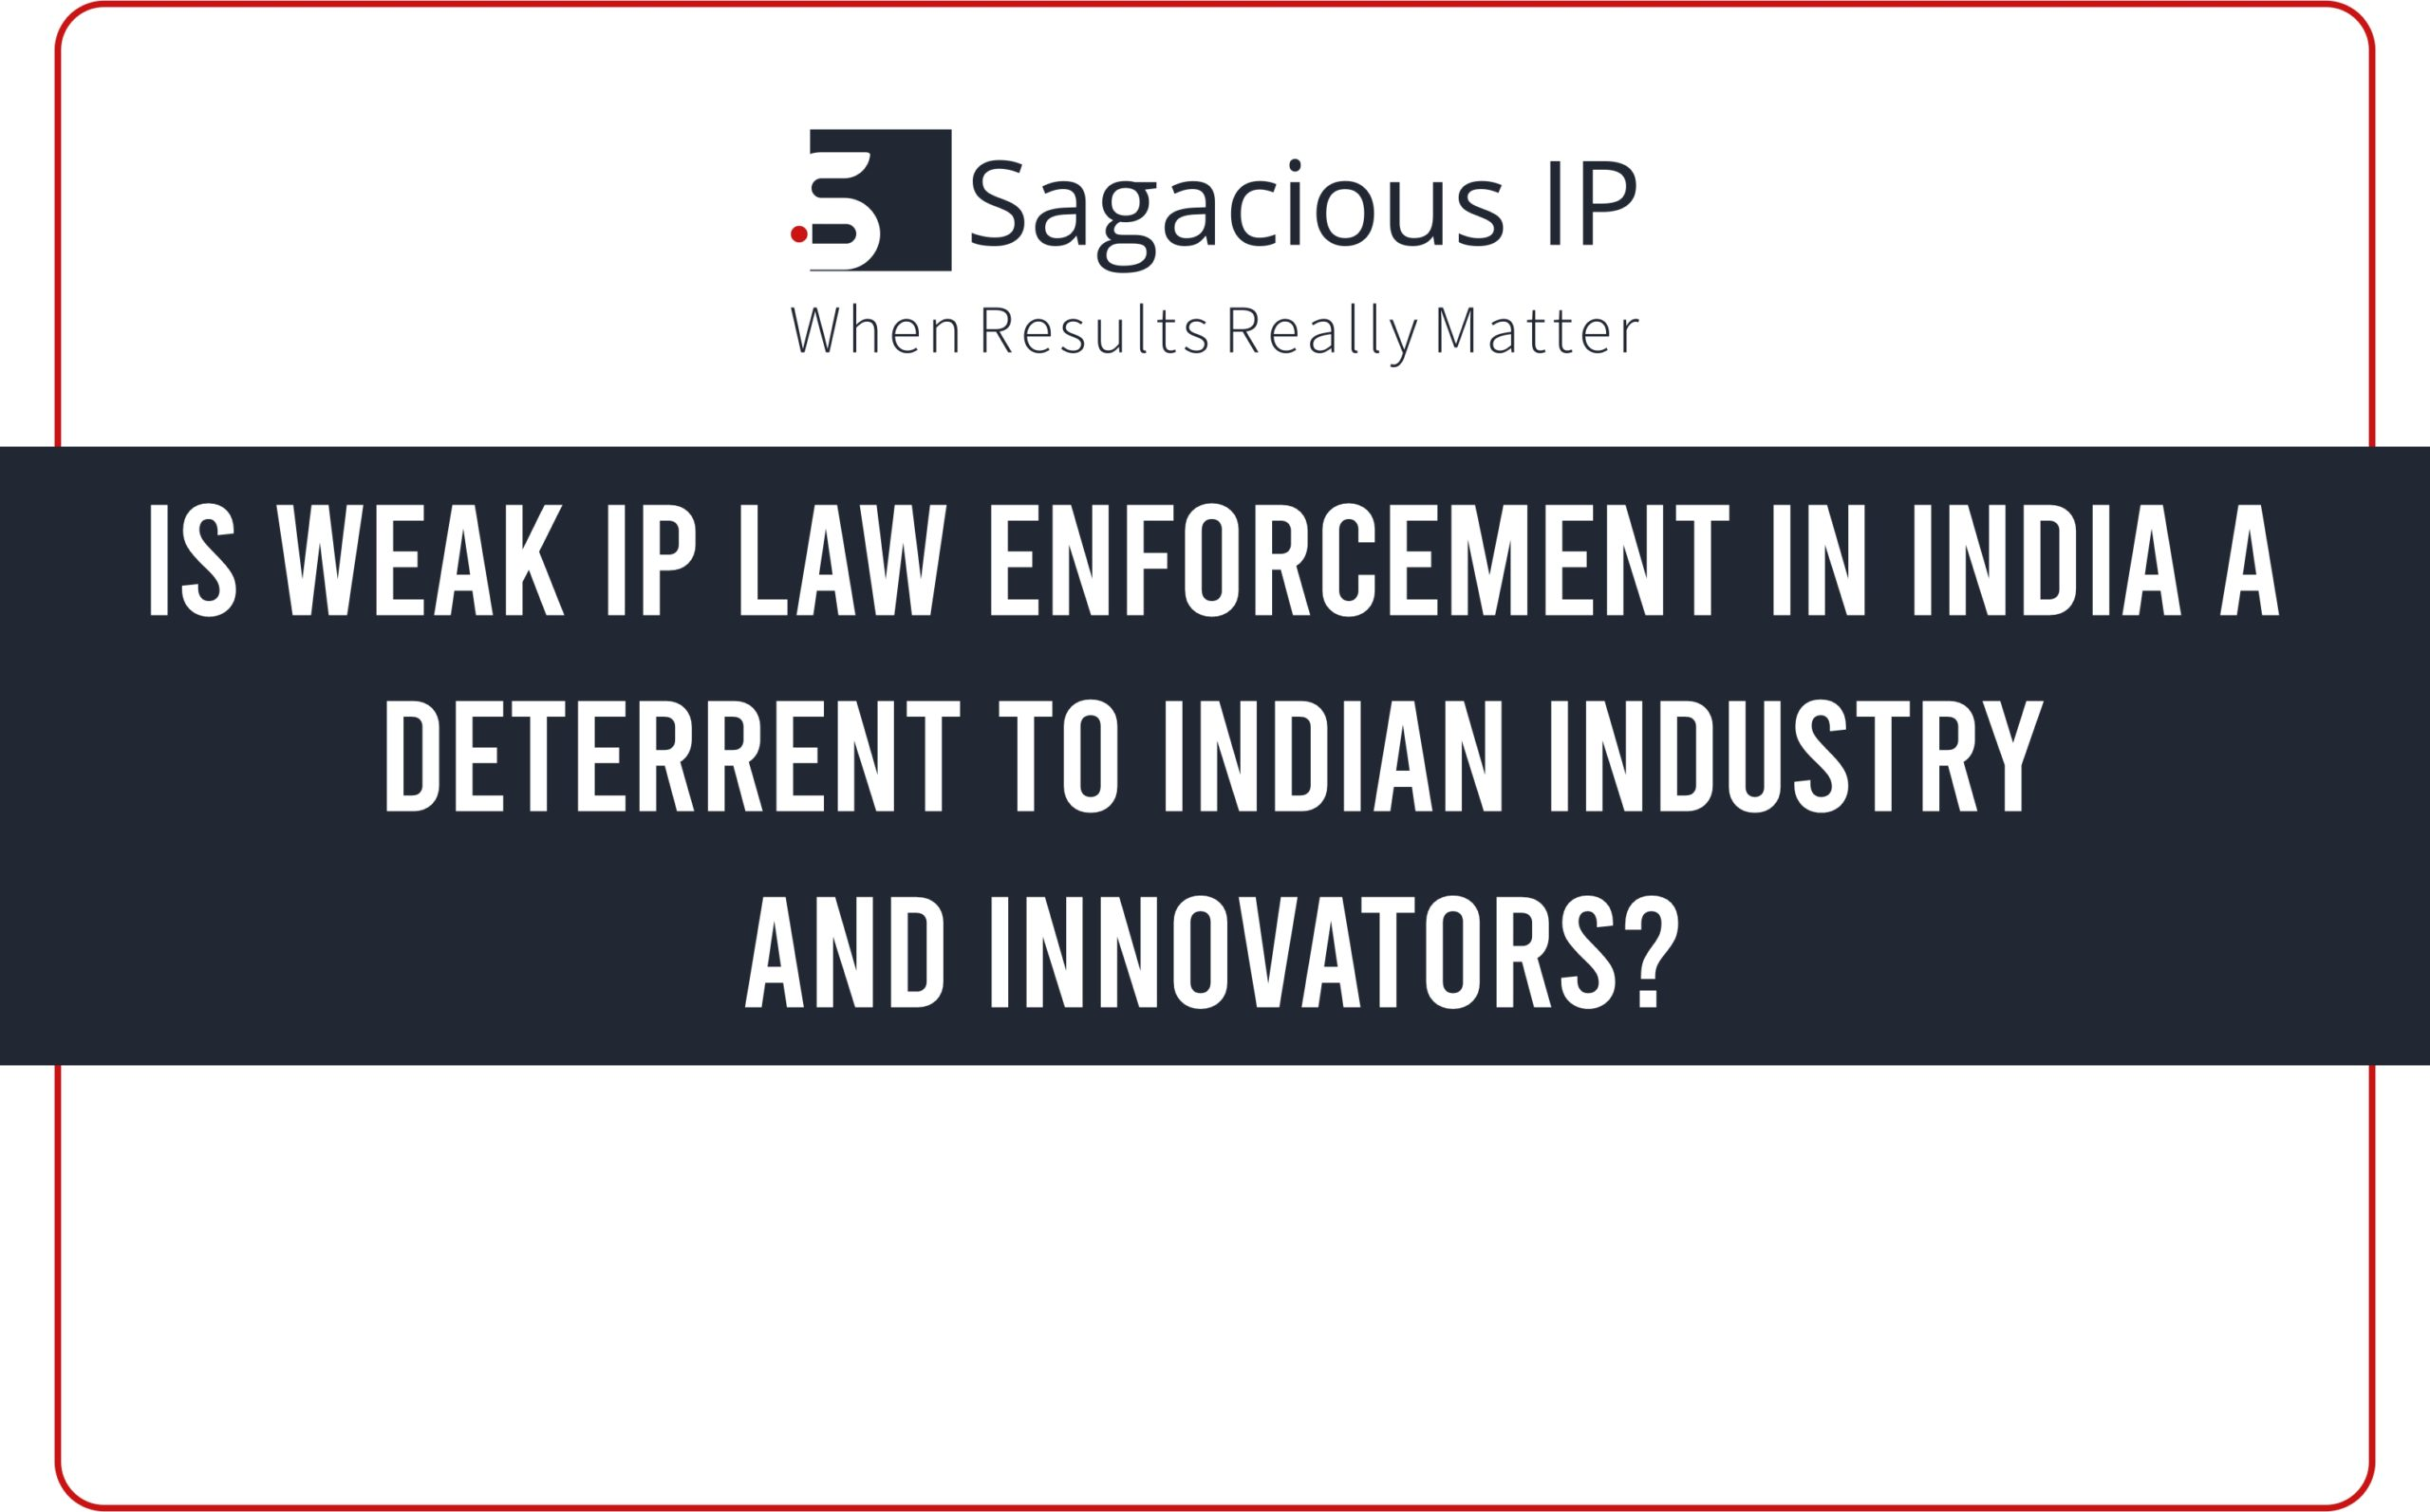 Is weak IP law enforcement in India